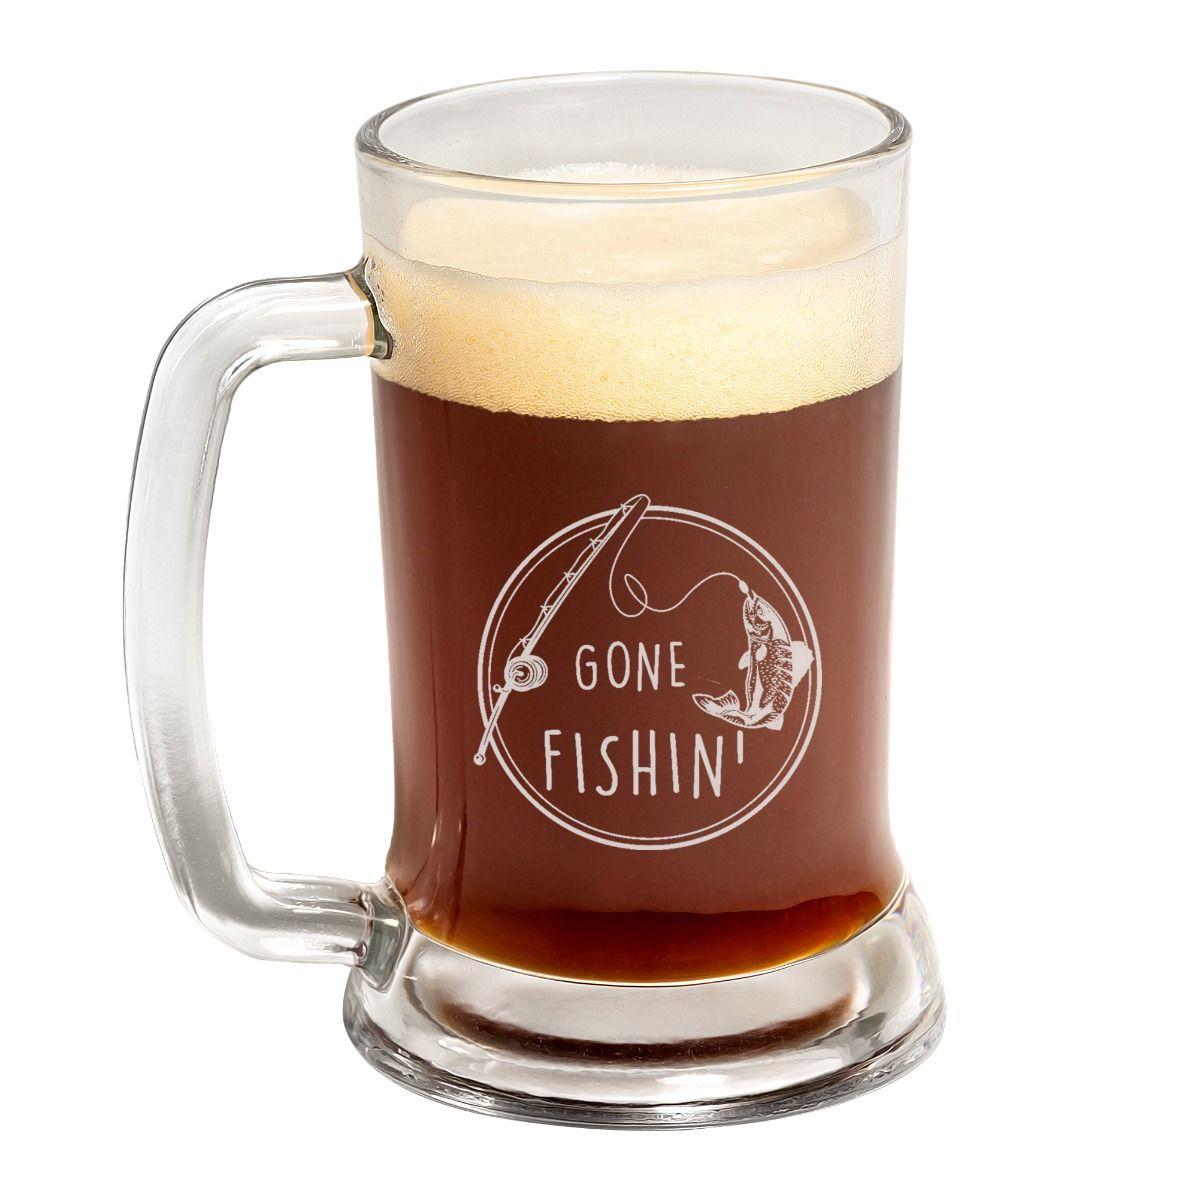 Gone Fishin' Father's Day Beer Mug